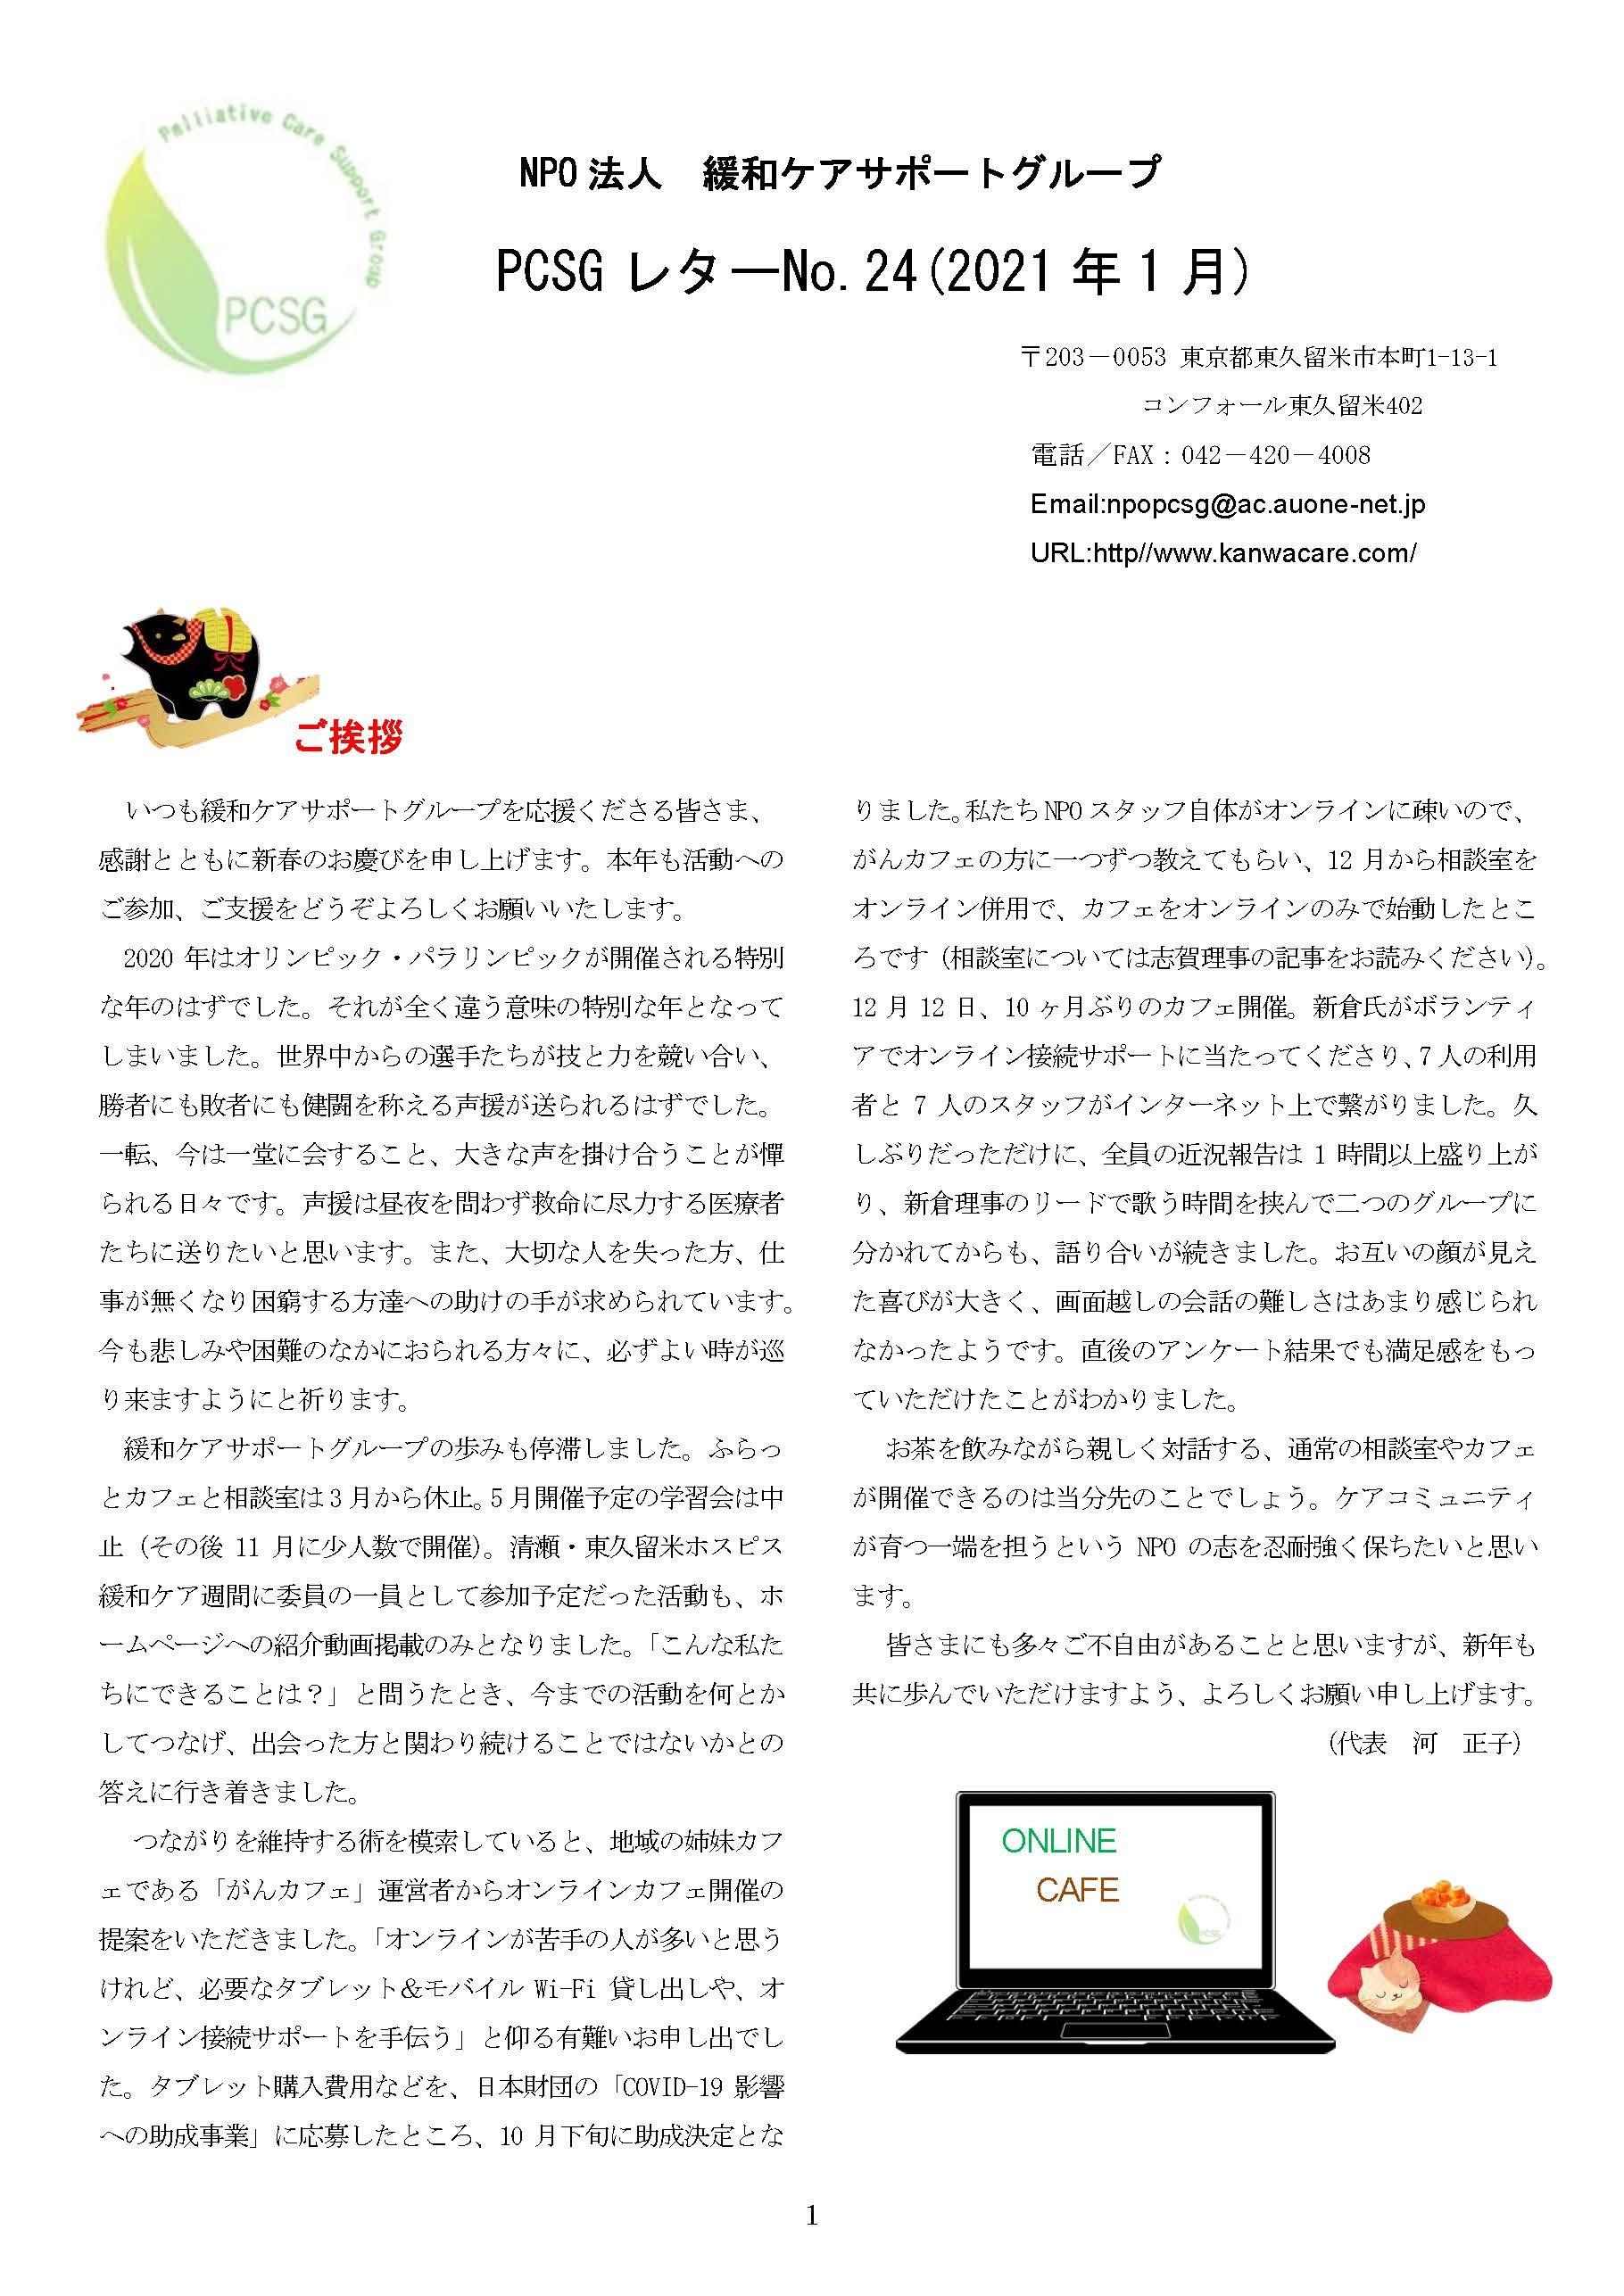 PCSGレター No.24(2021.1 第24号発行)_e0167087_16010648.jpg